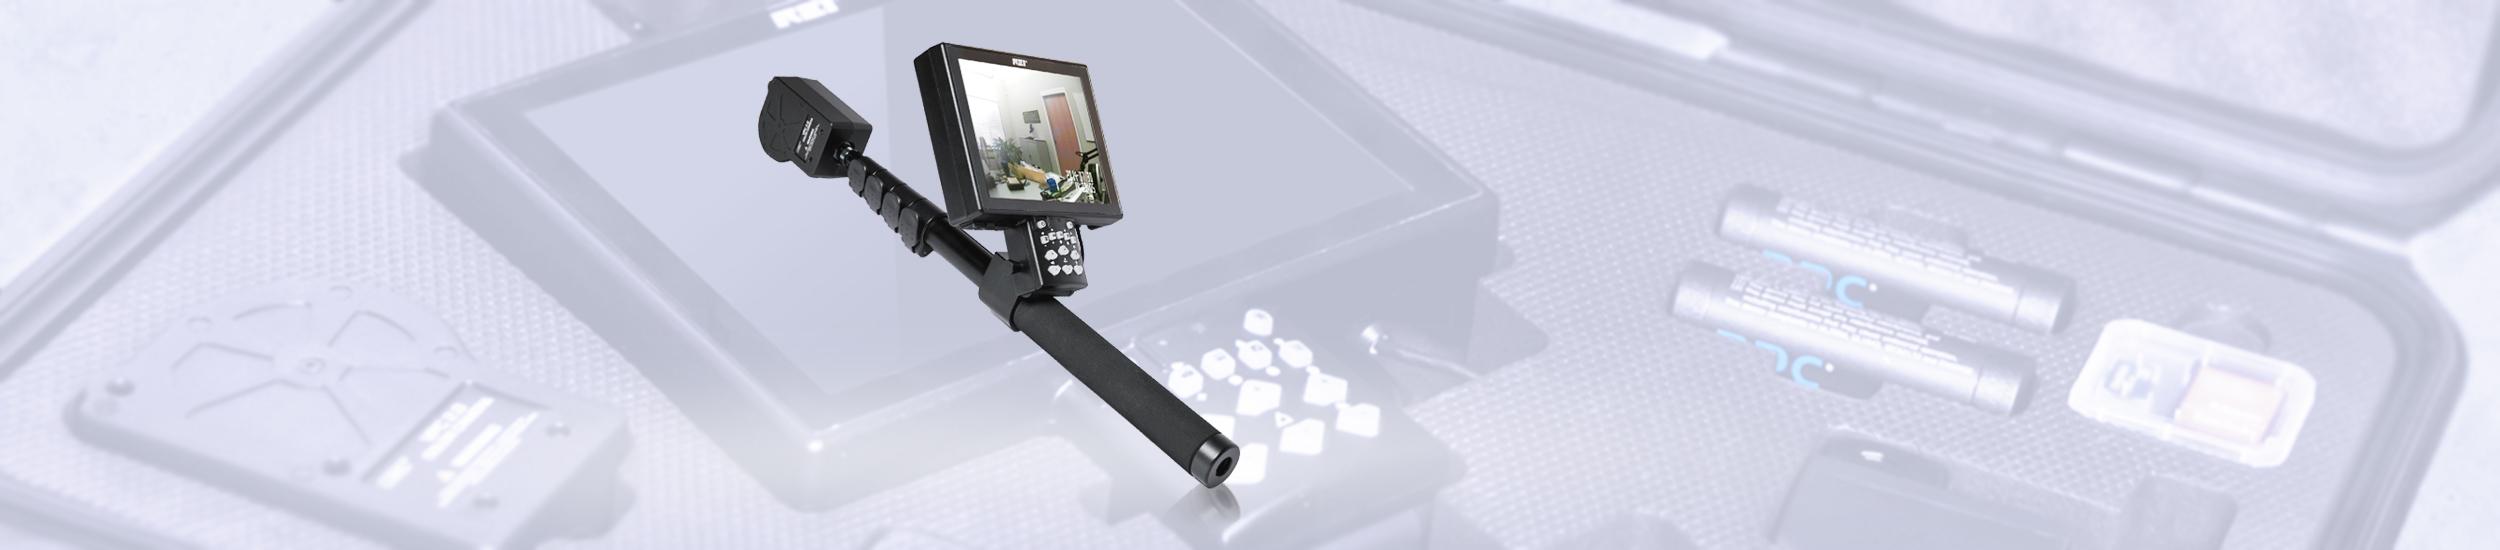 pole-camera-2